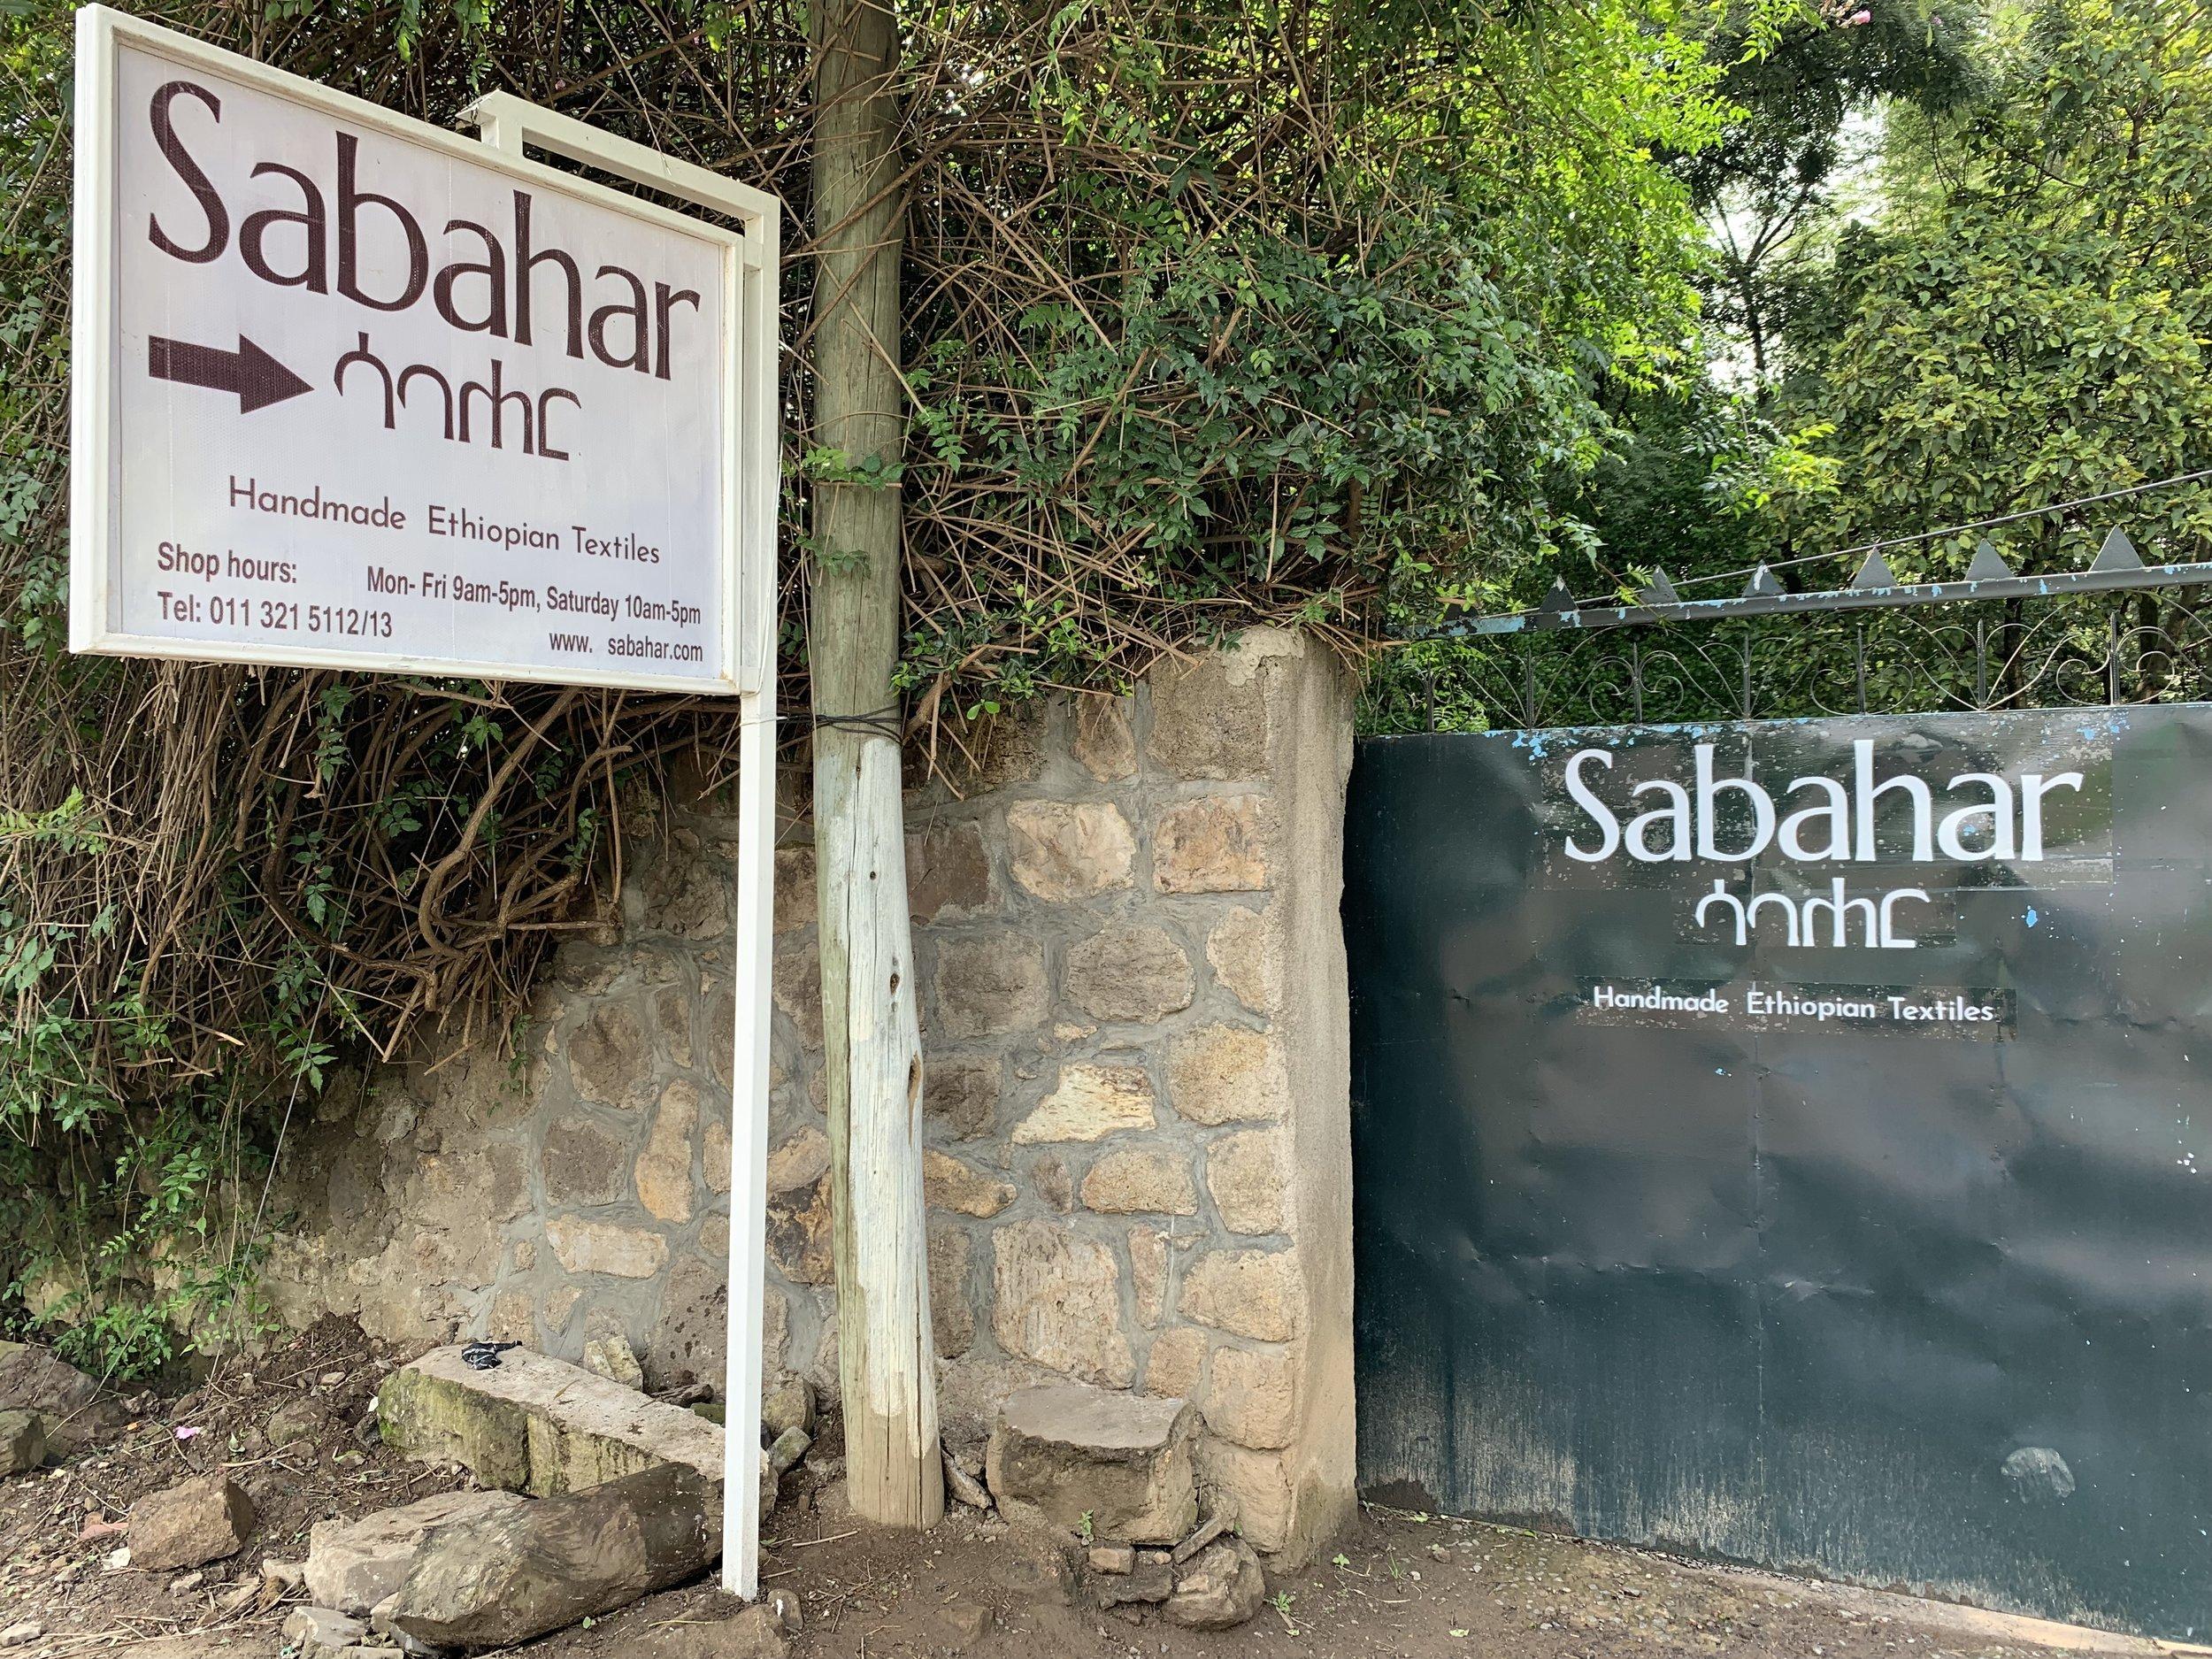 The entrance to Sabahar.